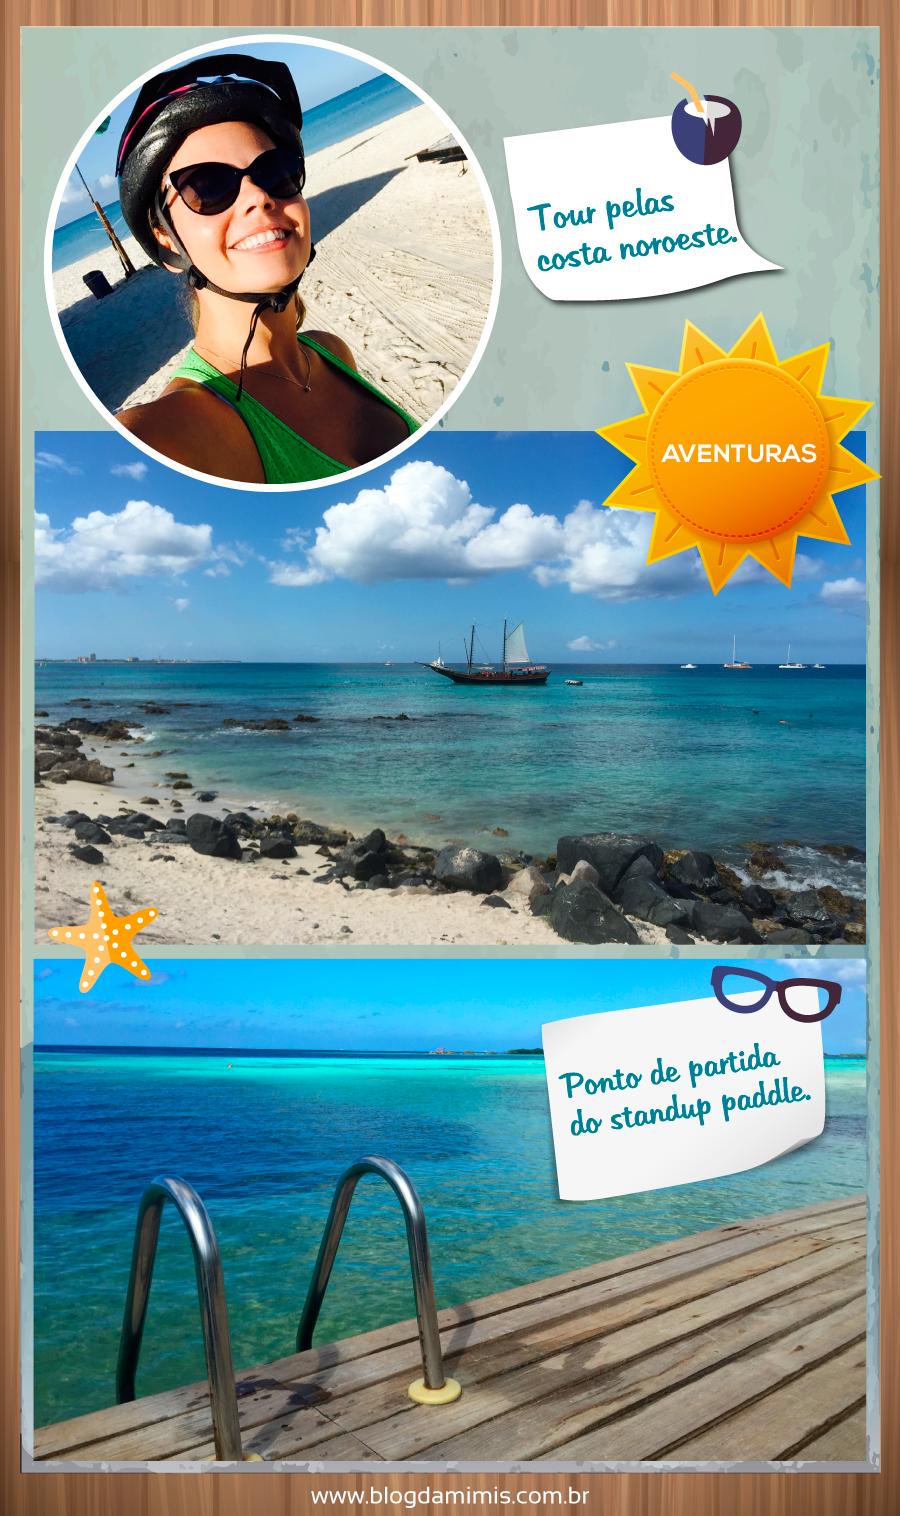 Aruba-a-ilha-feliz-blog-da-mimis-michelle-franzoni-03